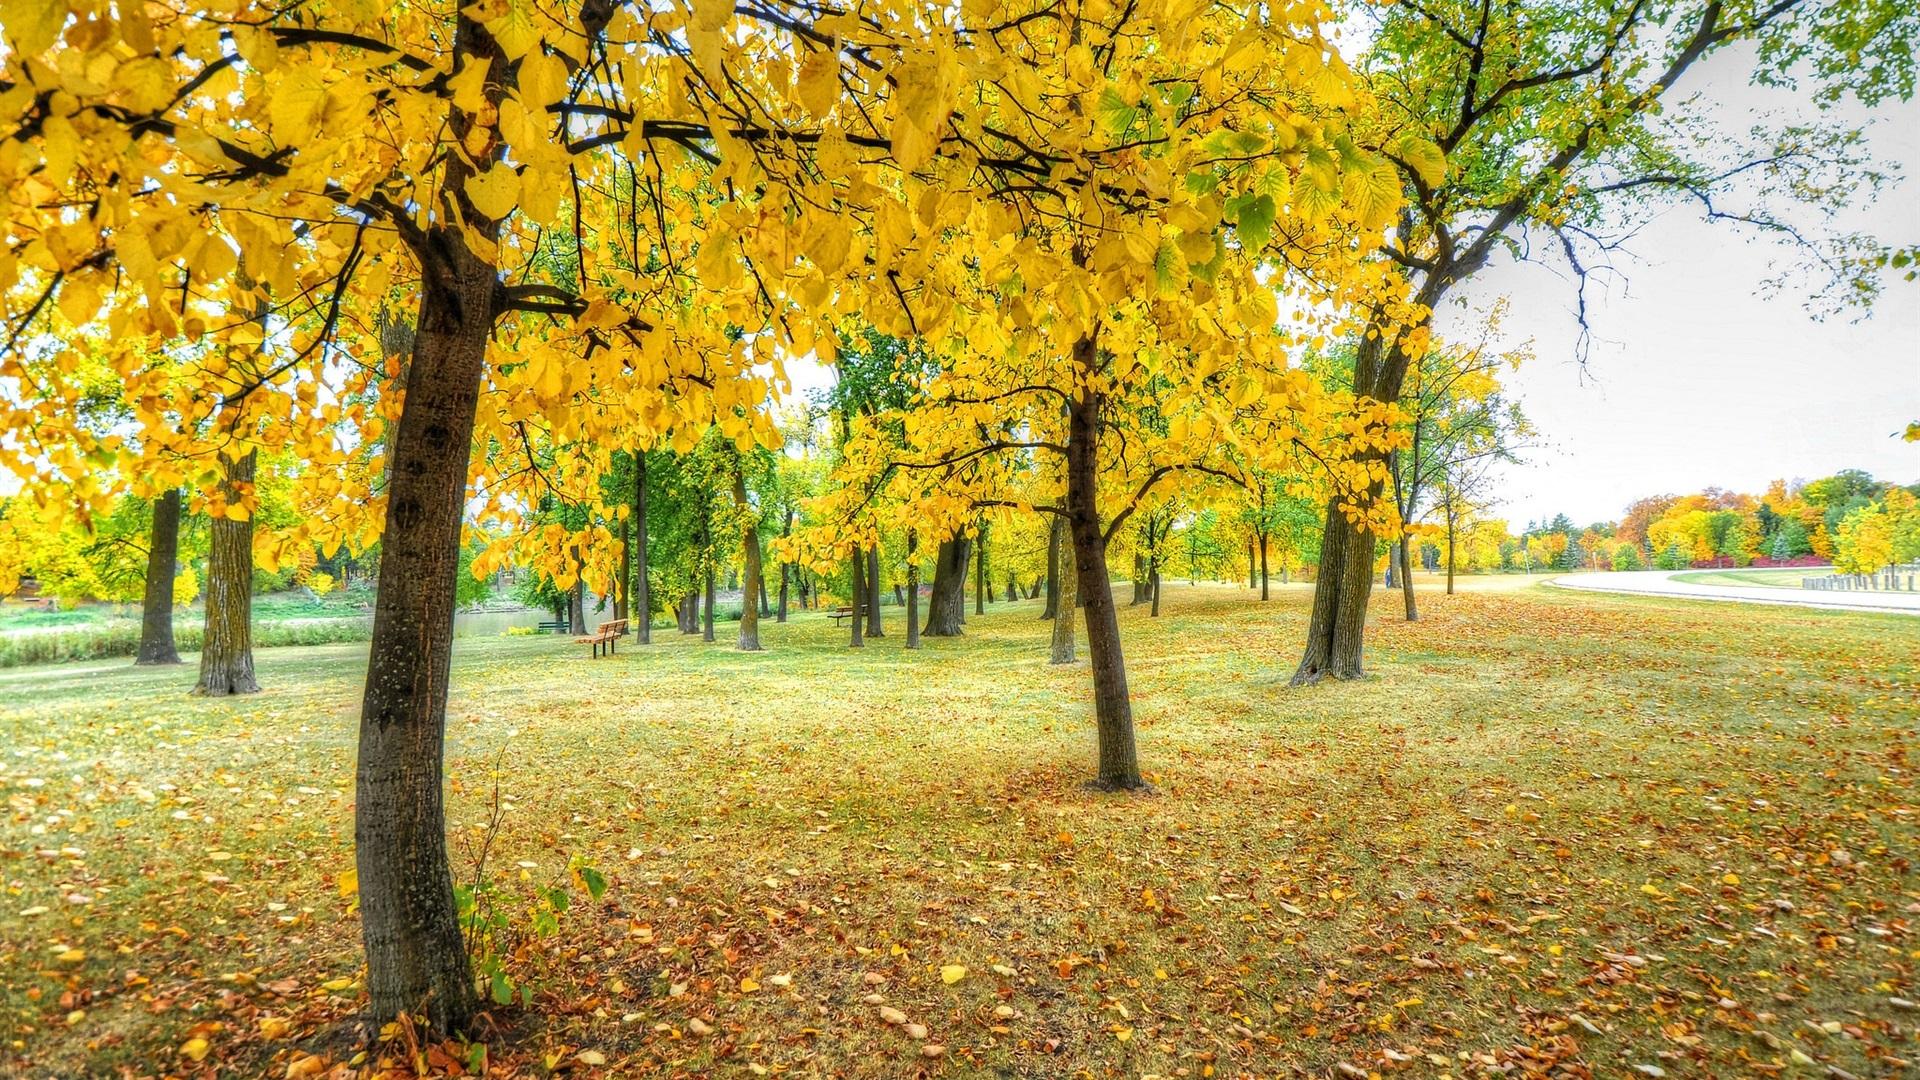 autumn park wallpaper 1920x1080 - photo #23